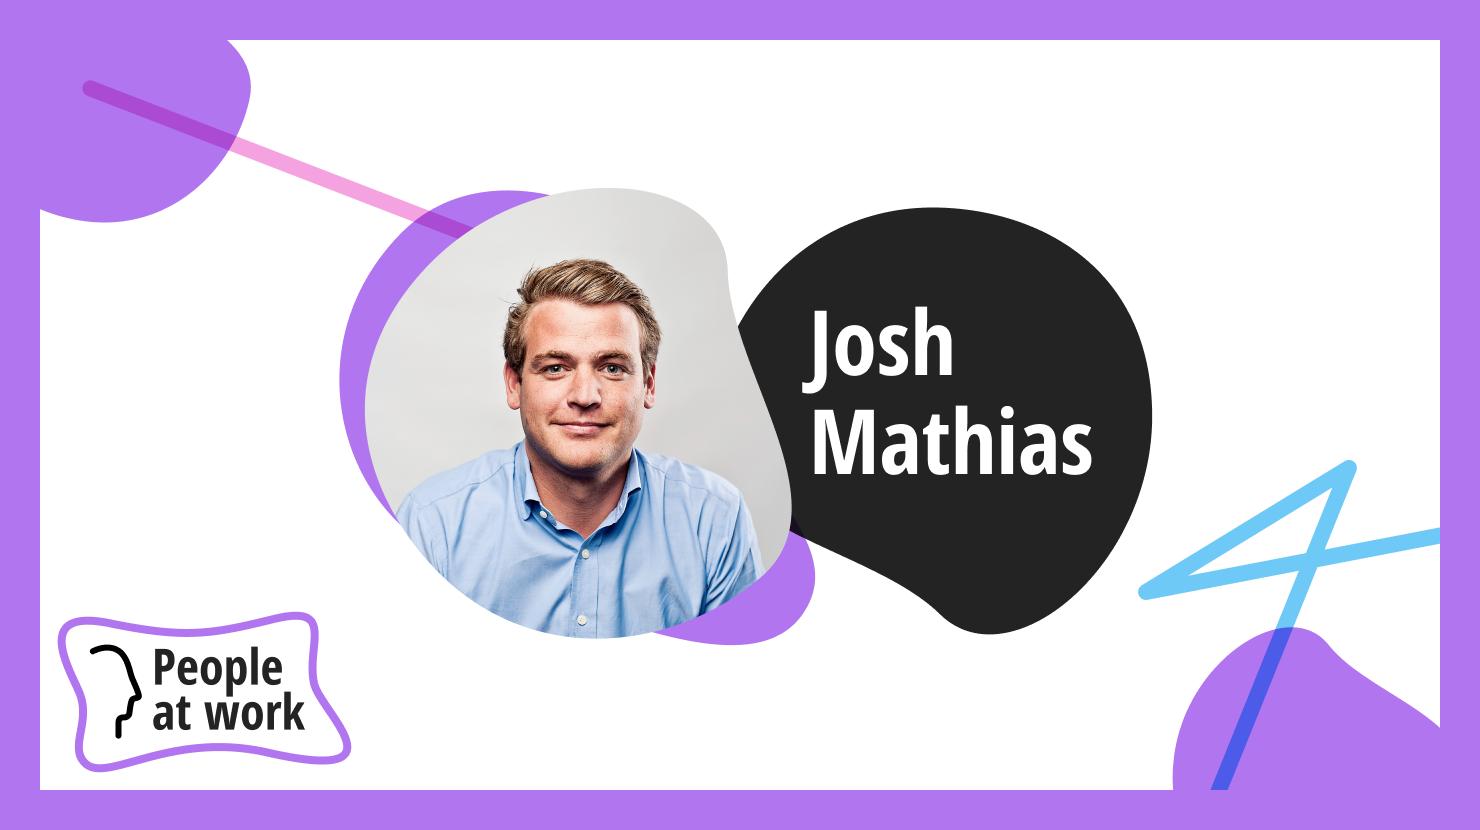 The value of aligning values with Josh Mathias